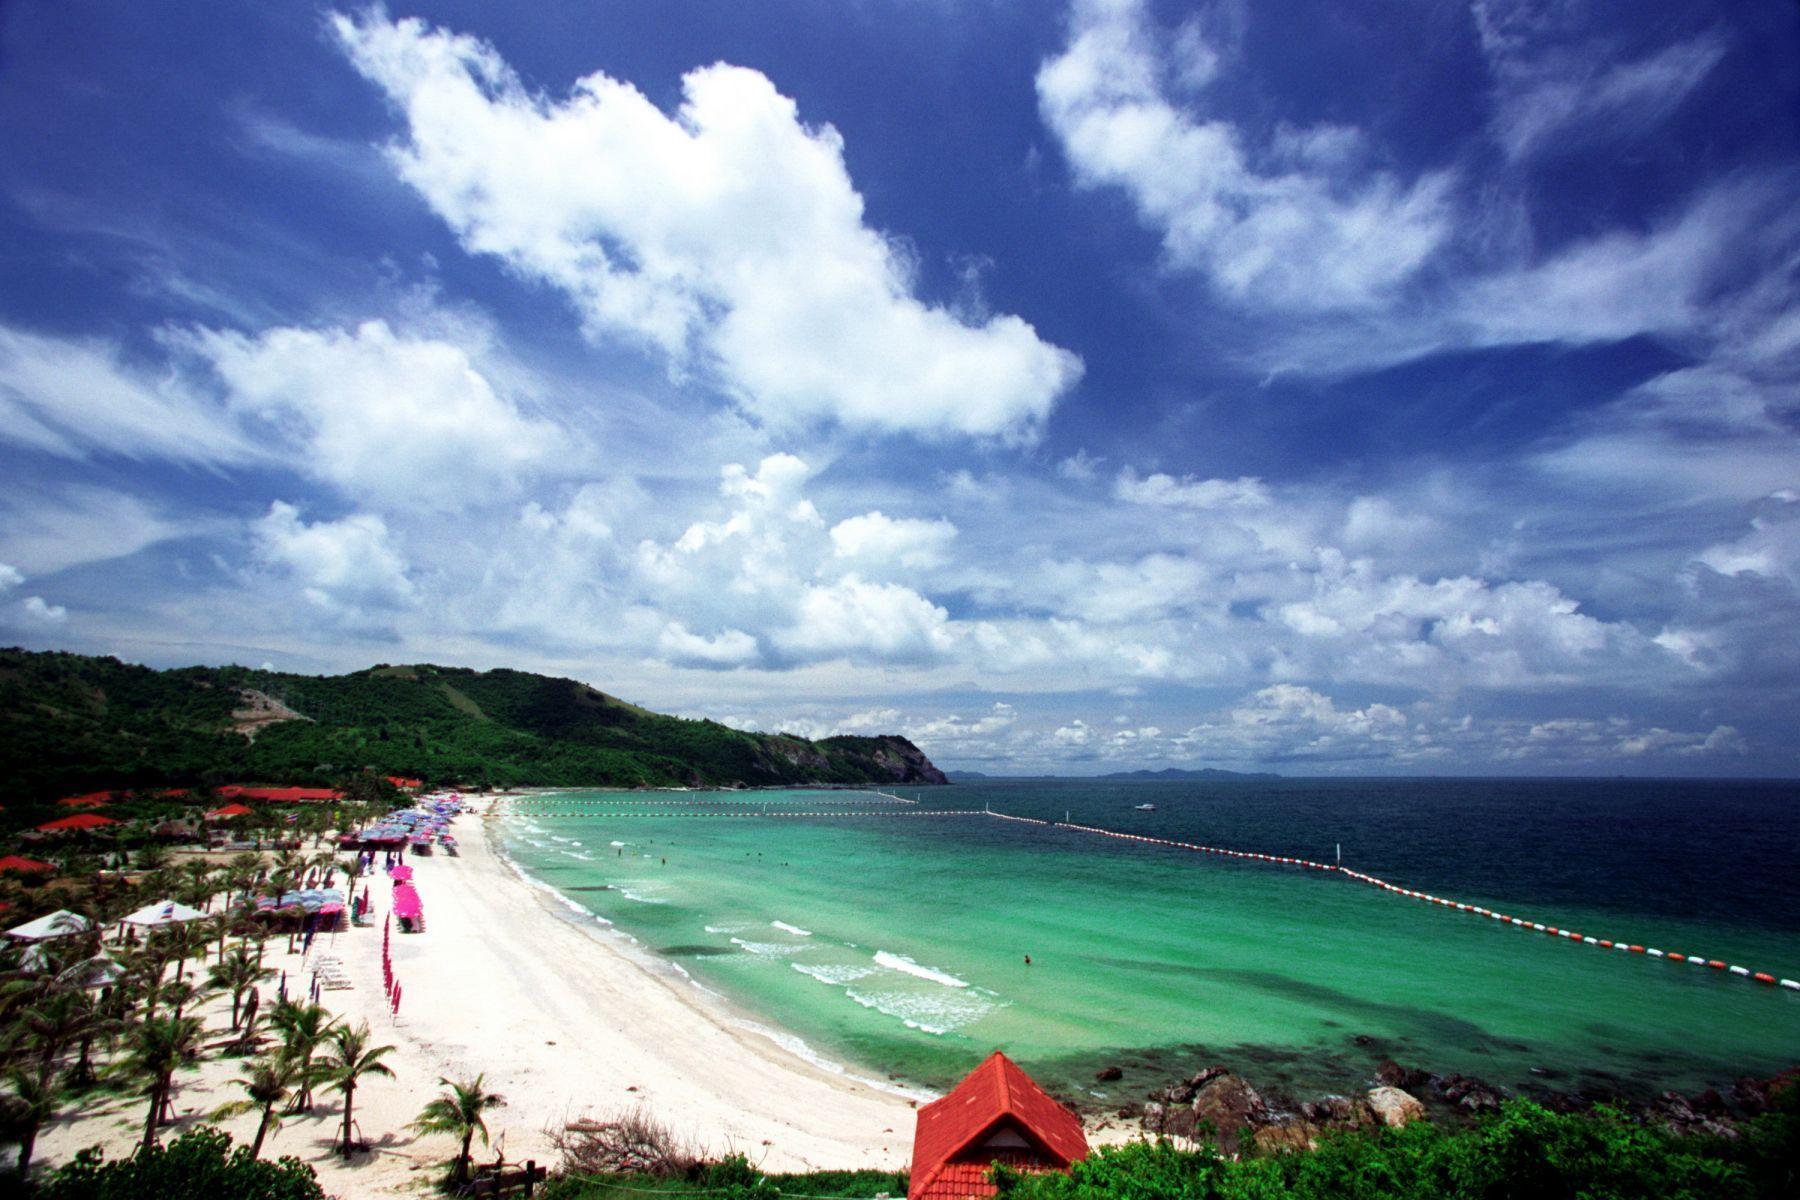 Pattaya Beach Thailand | HD Beach Wallpapers for Mobile and Desktop